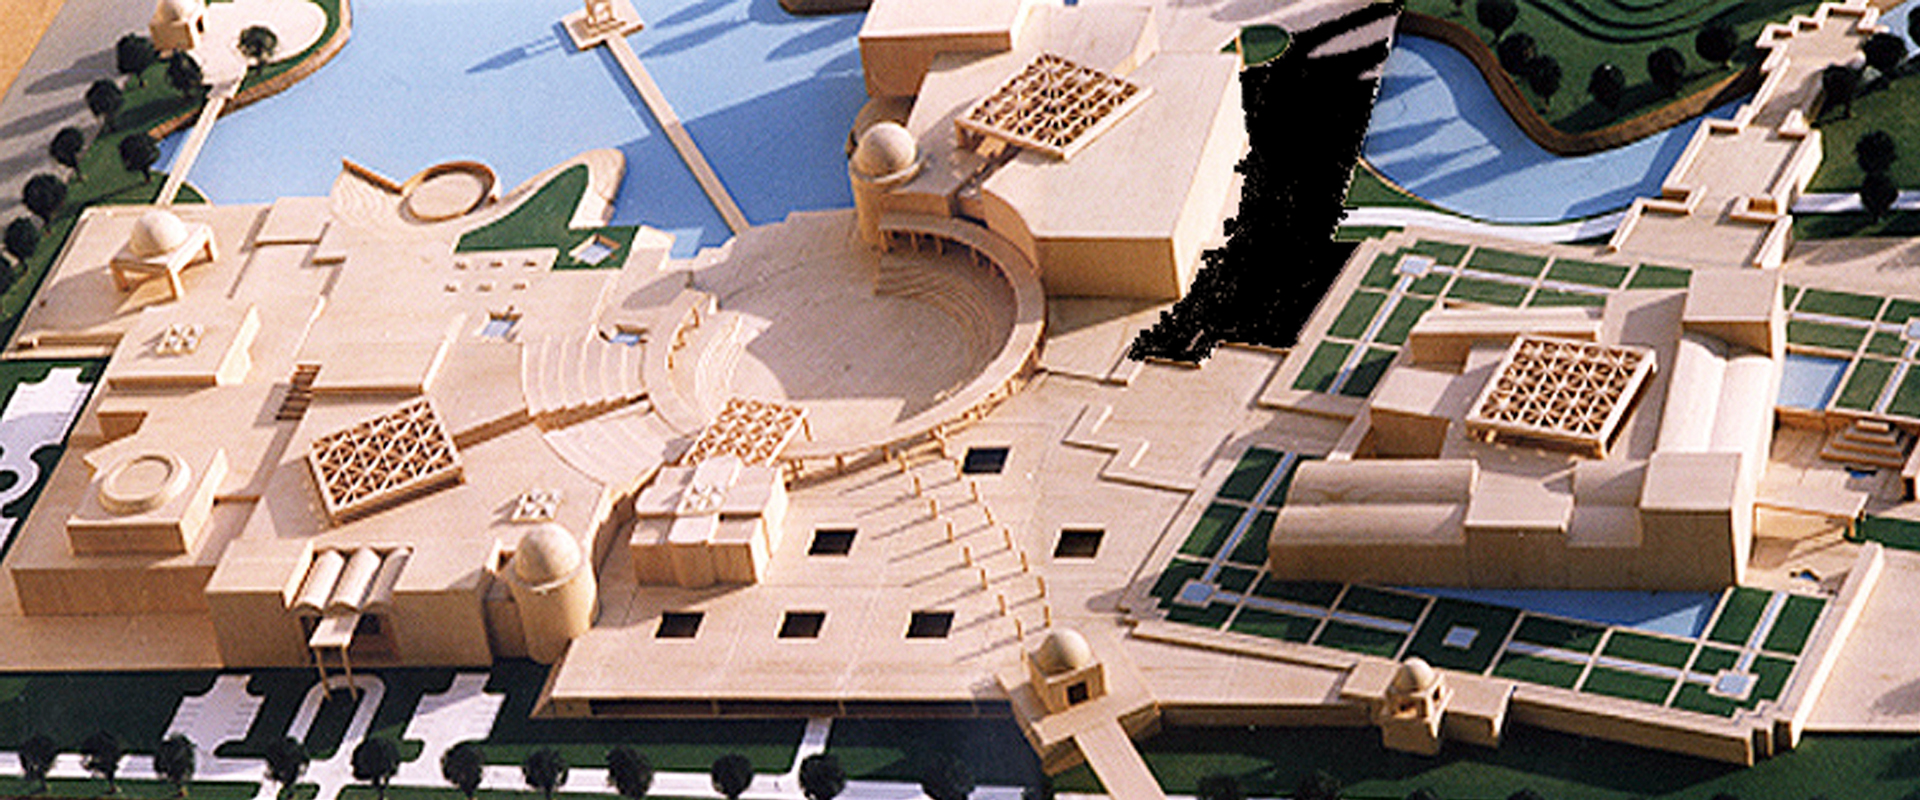 INDIRA GANDHI CULTURAL CENTER